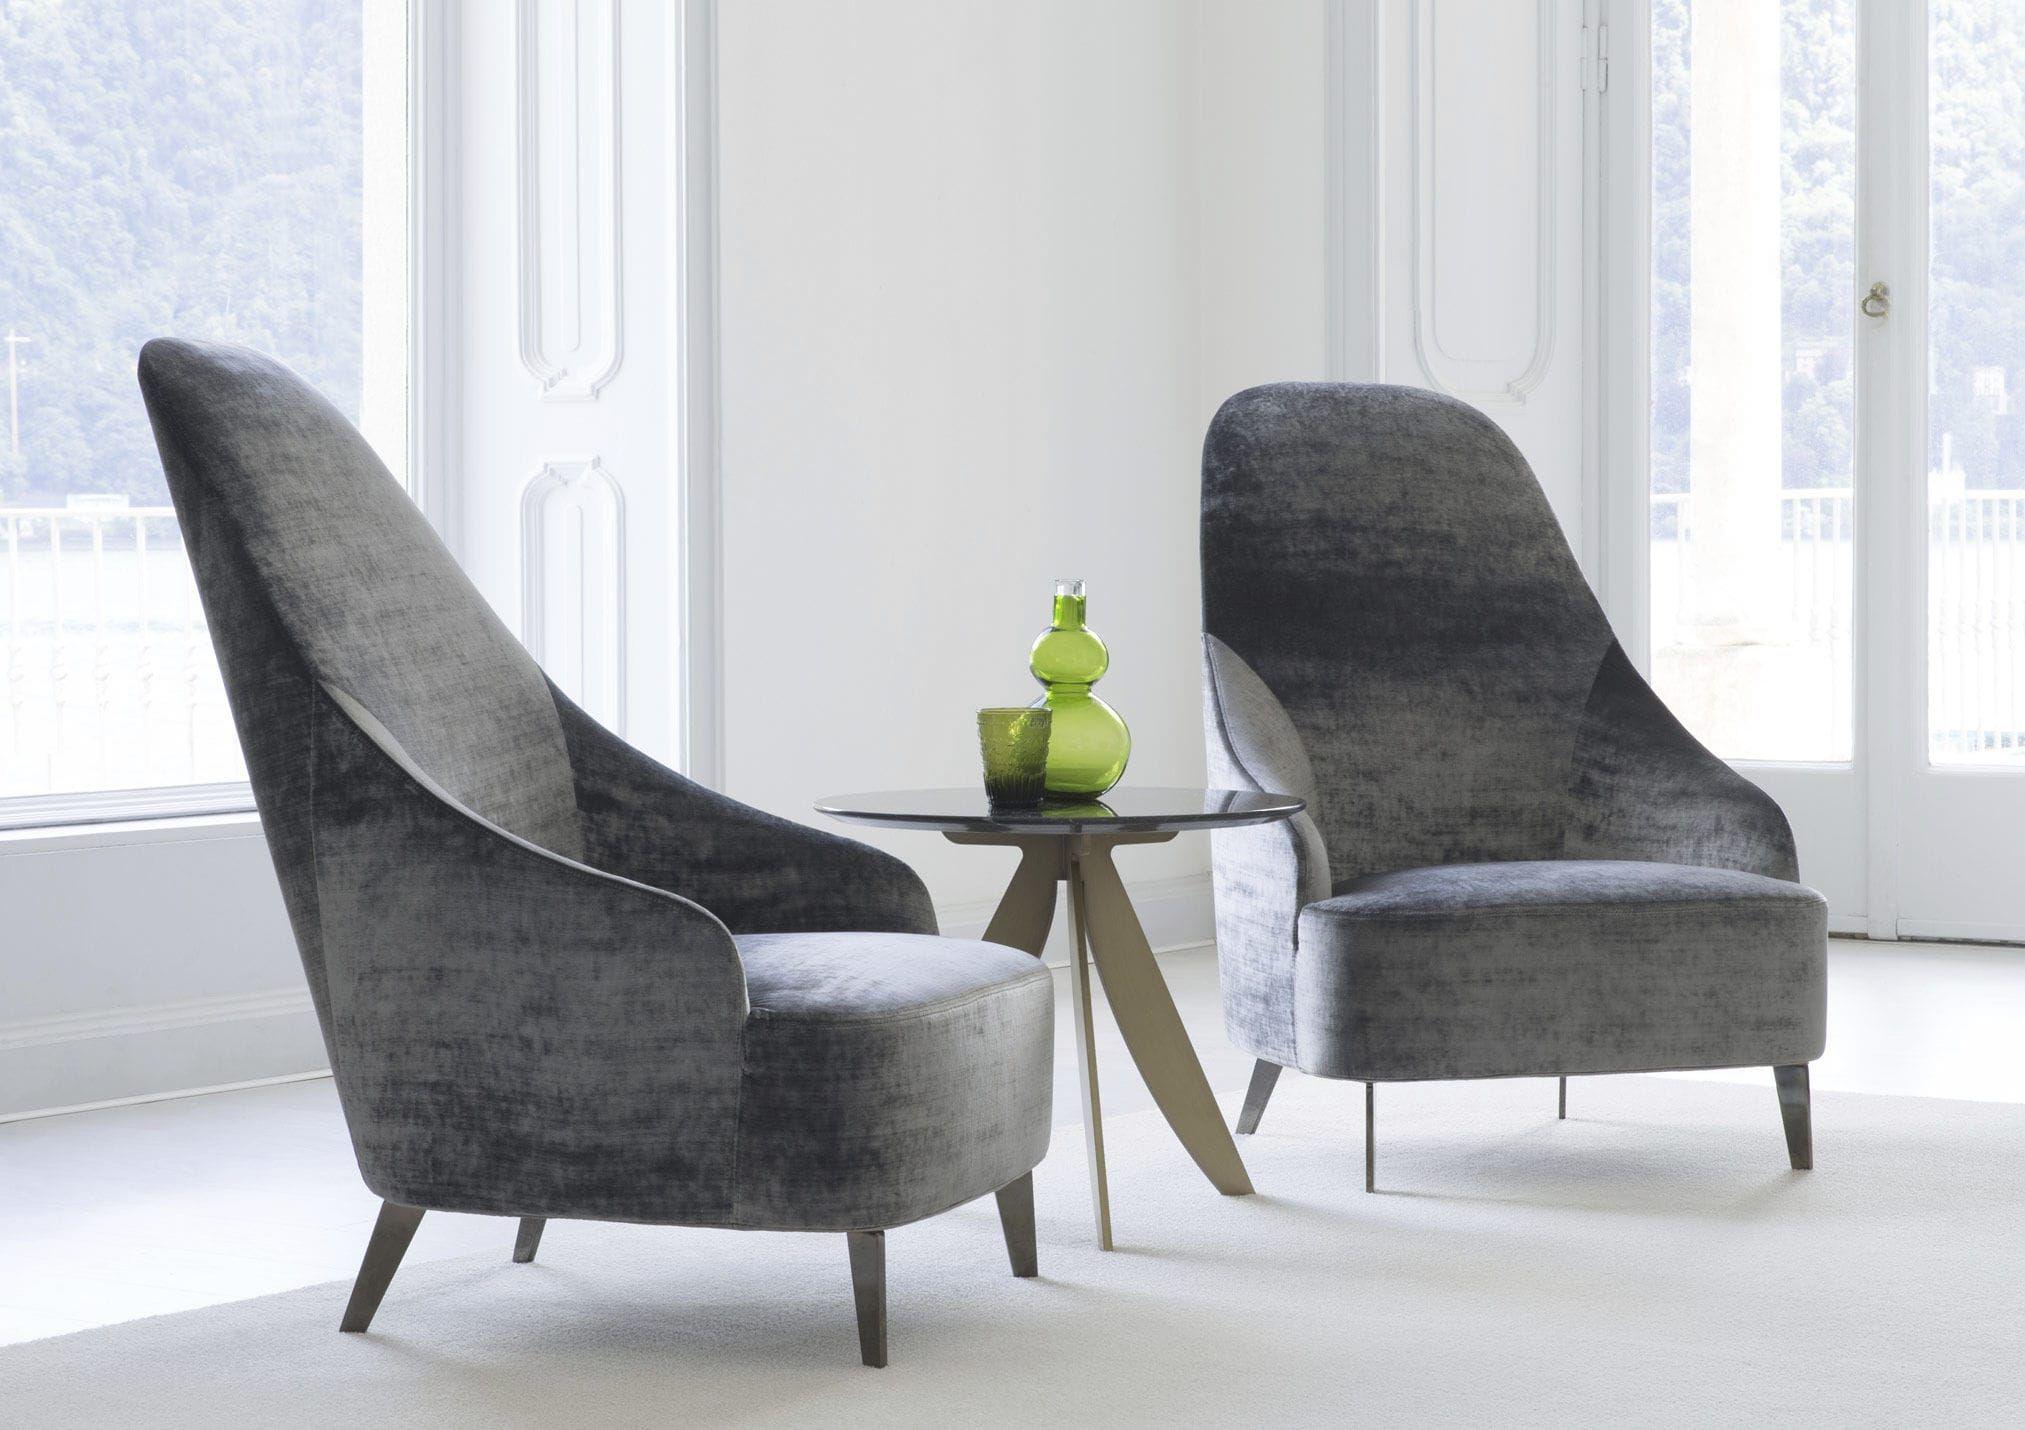 Contemporary Armchairs Contemporary Armchair Fabric Leather High Back High Back Armchair Contemporary Armchair Upholstery Armchair